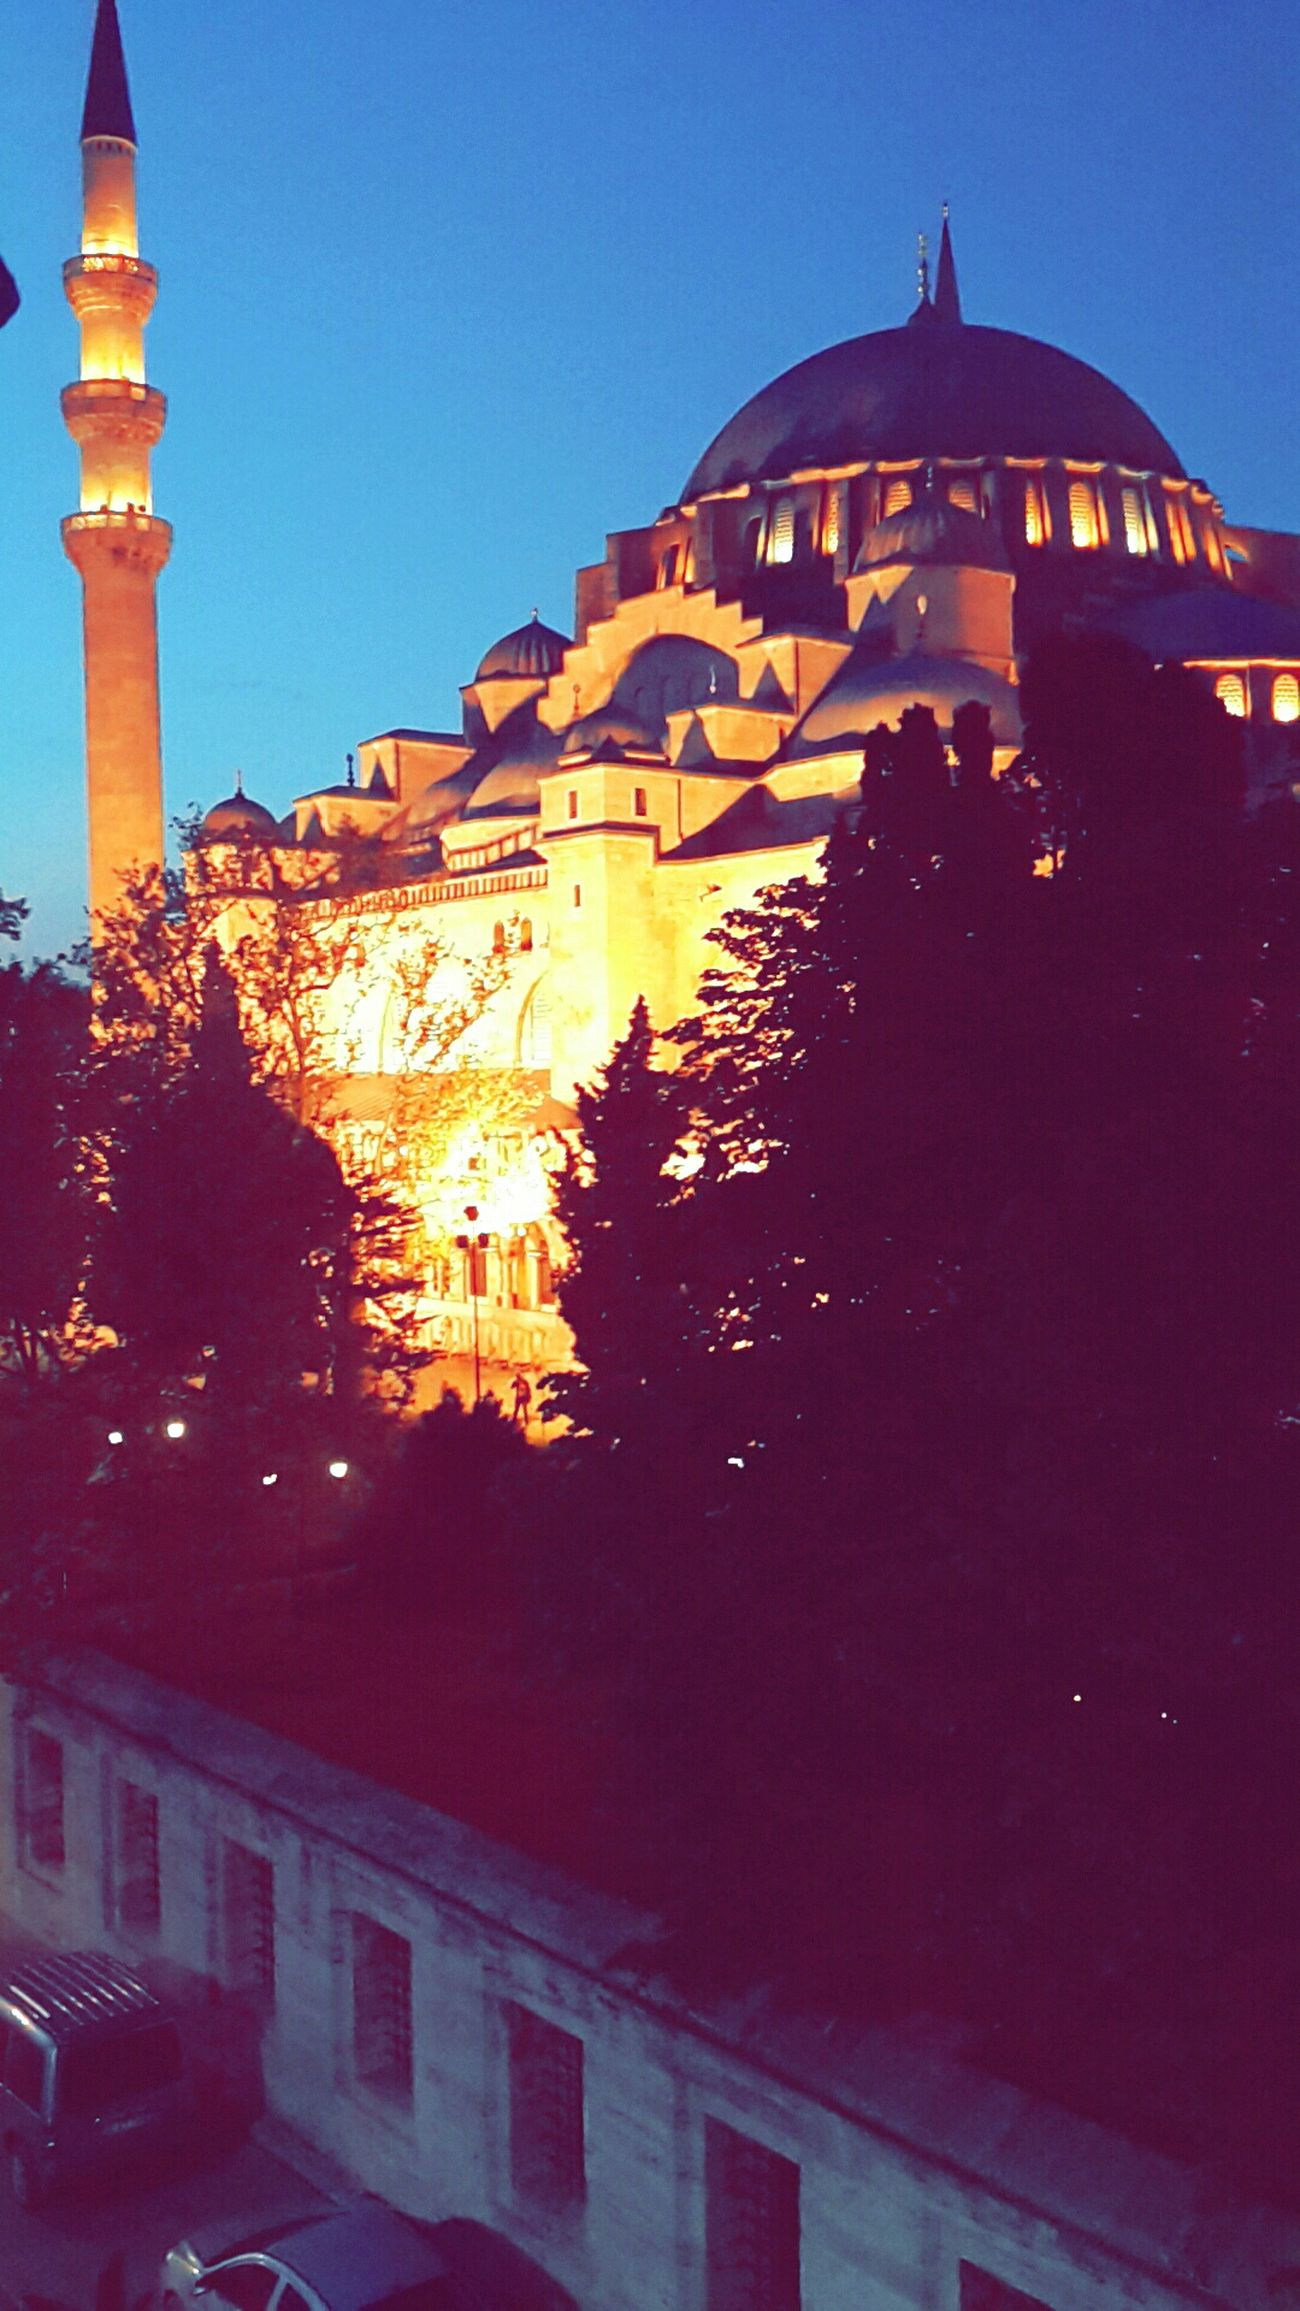 Yedi saray kurdum yedi tepede 3.Saray Suleymaniye Mosque Iu